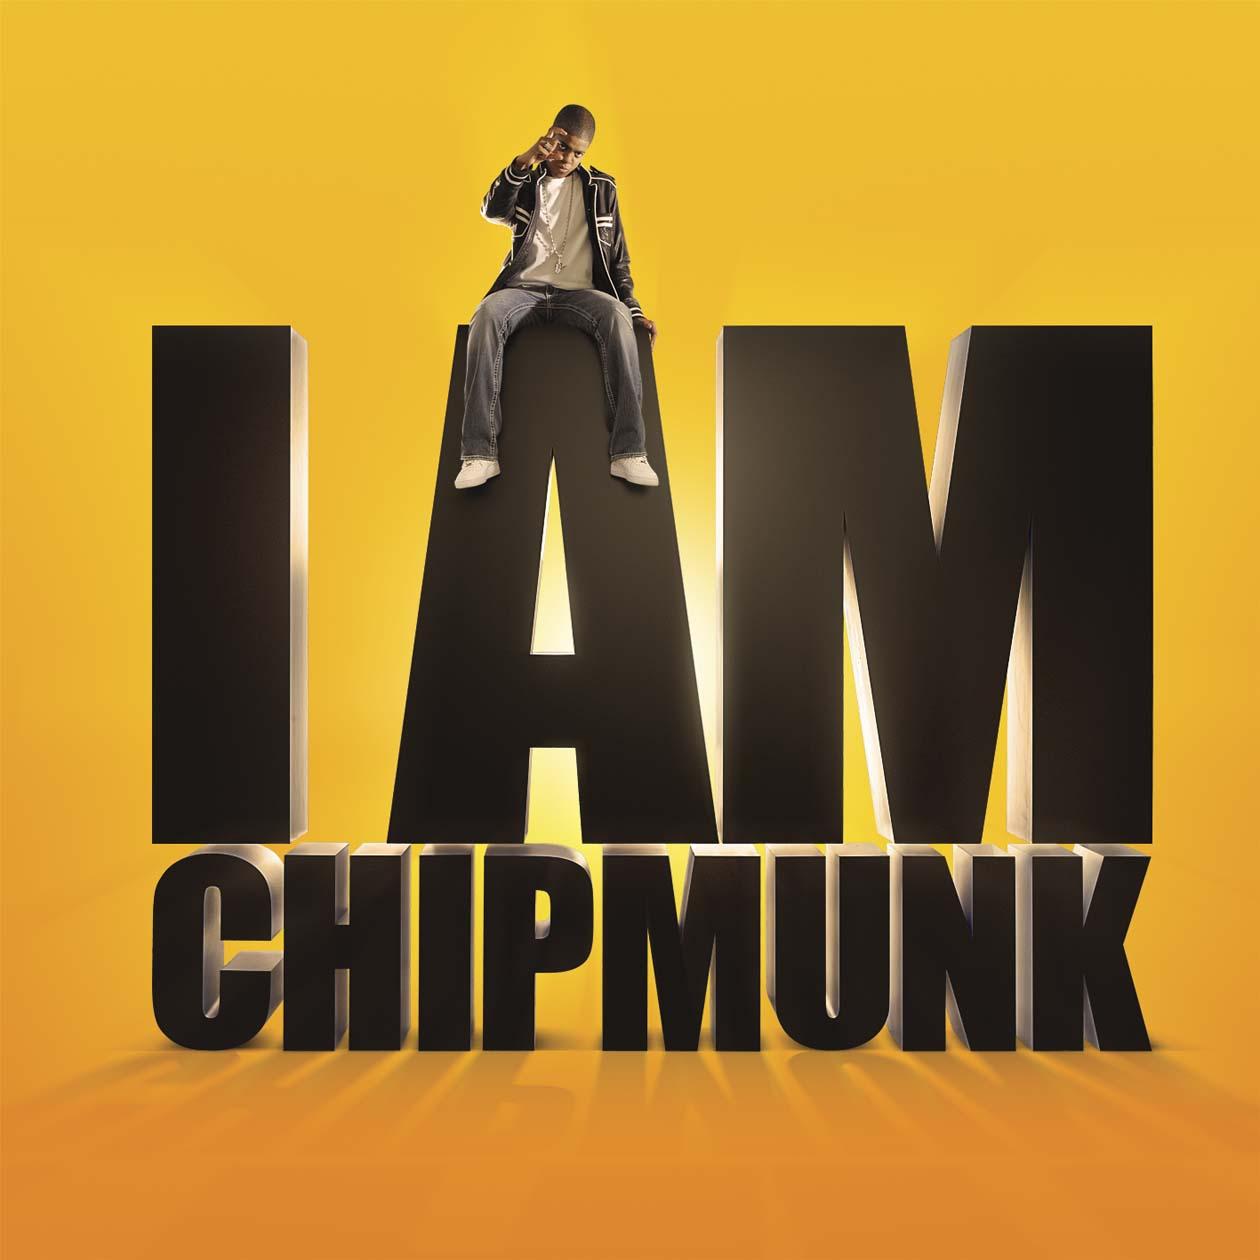 [00's] Chipmunk - Until You Were Gone (2009) Chip%20-%20I%20Am%20Chipmunk